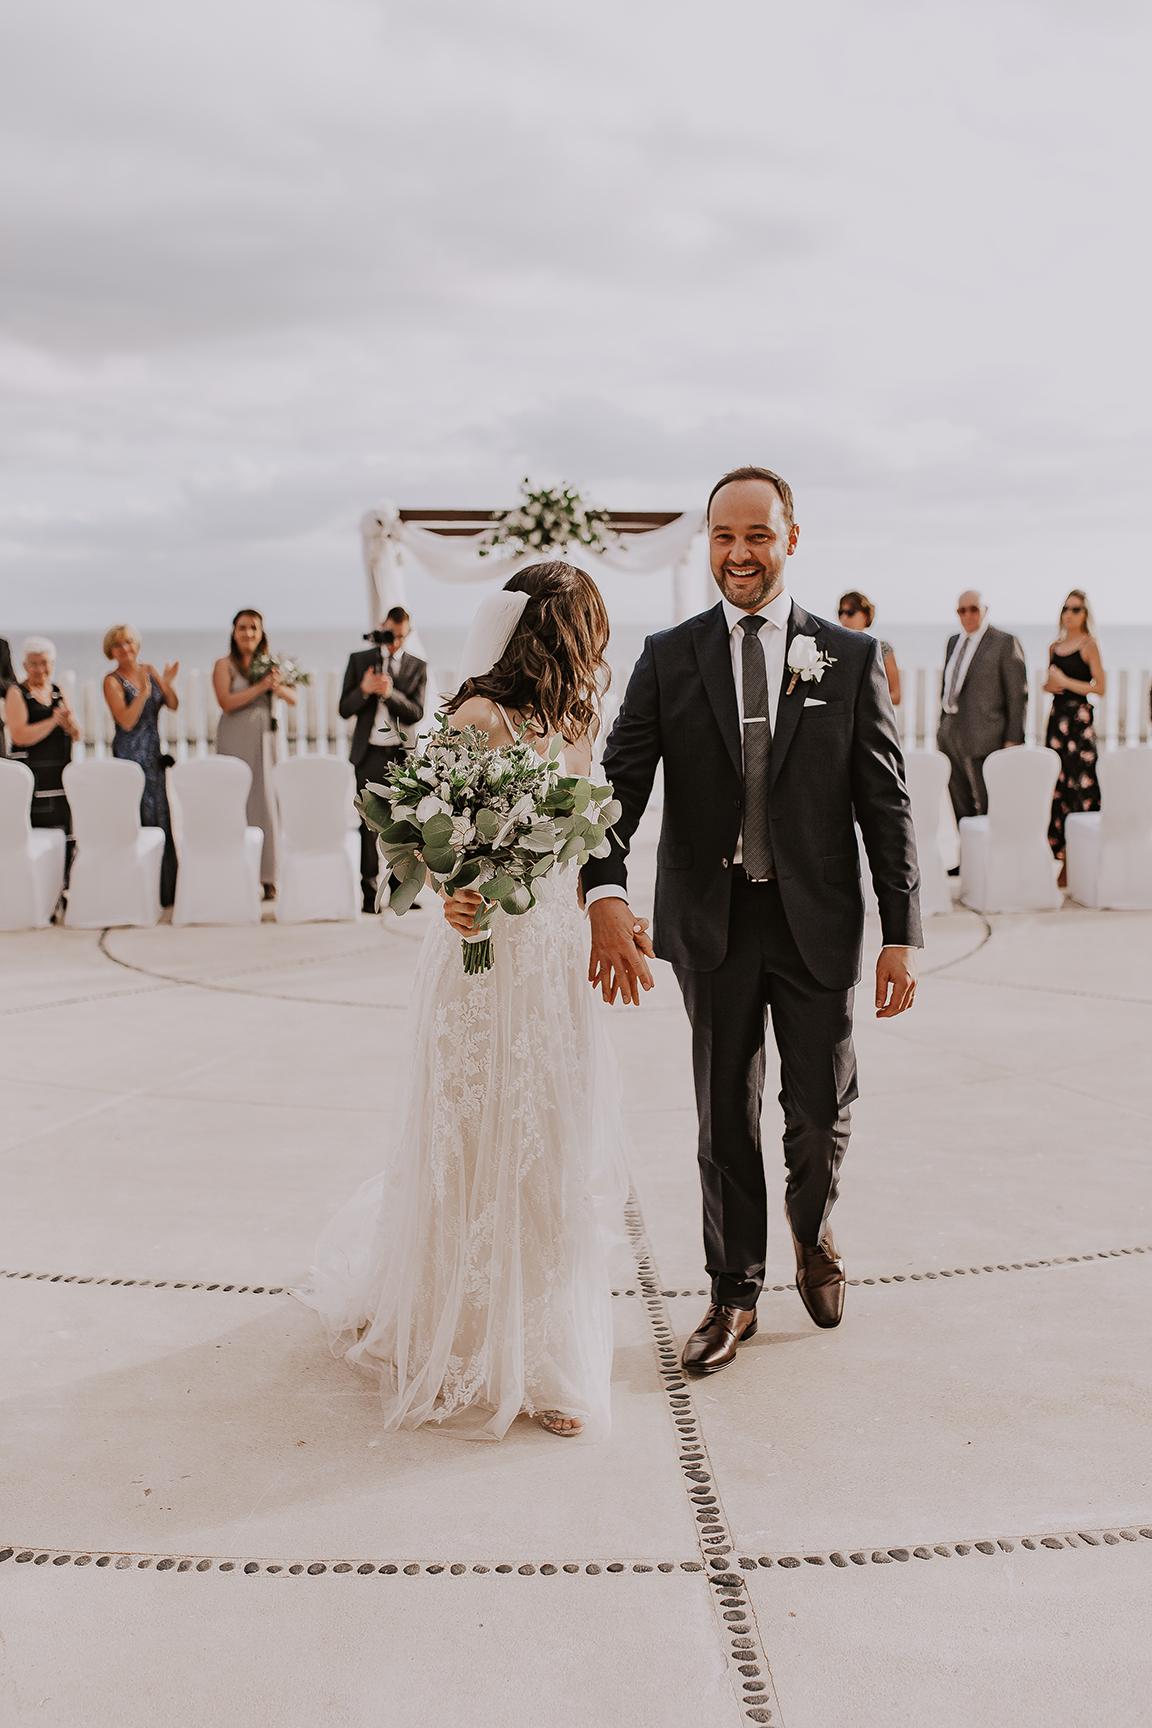 Lindsei+James_cabo_wedding_556.jpg